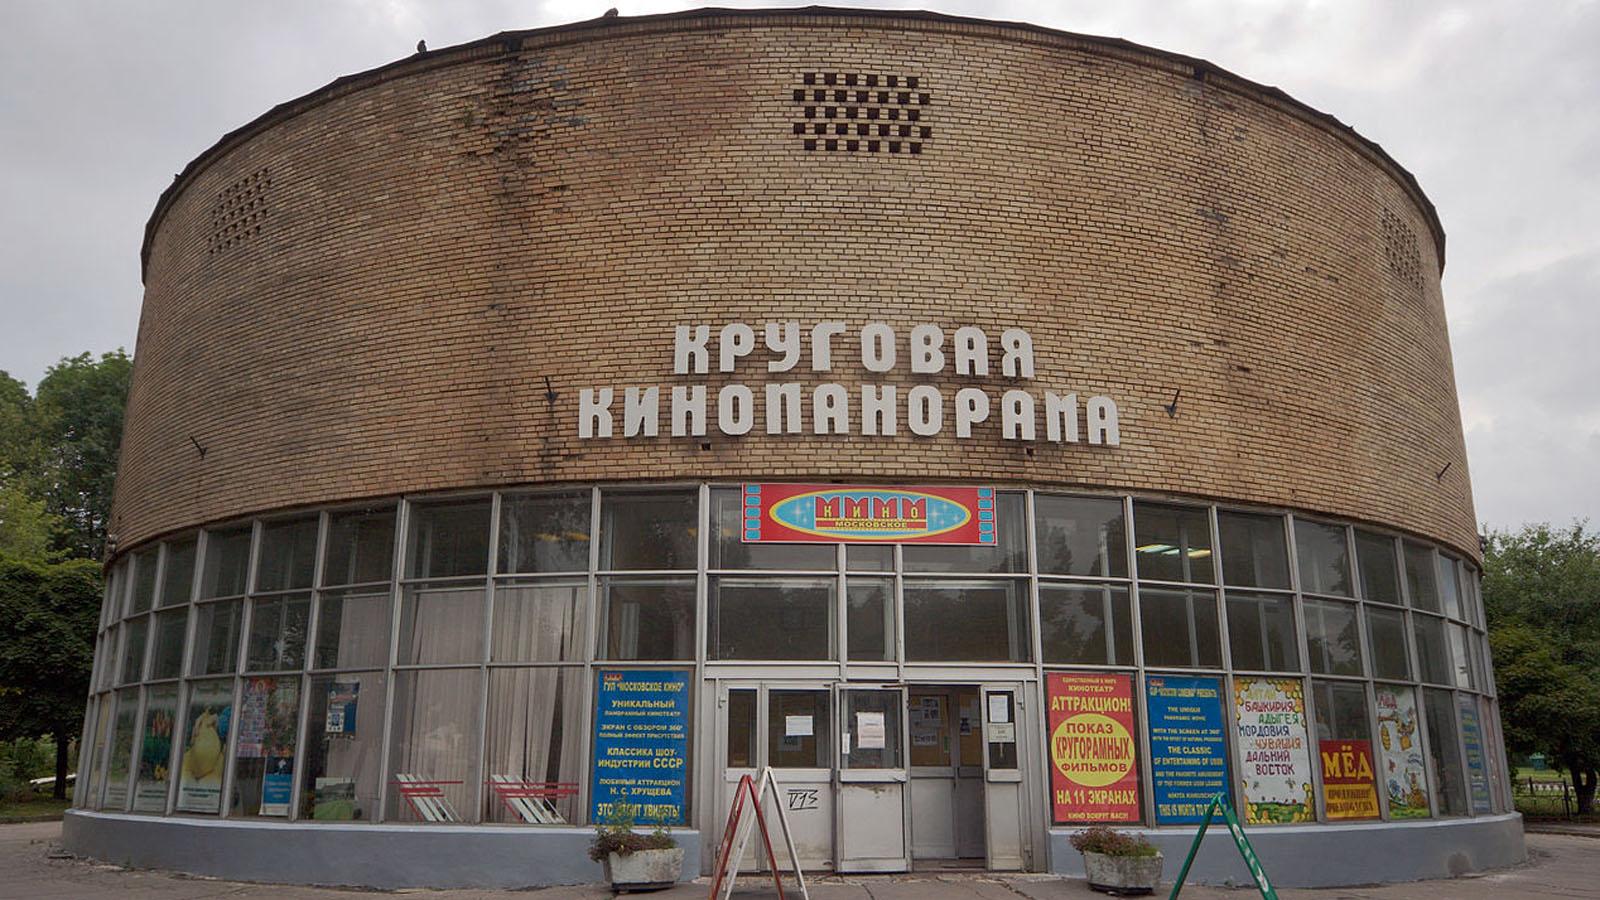 1280px-Russia-Moscow-VVC-KrugovayaKinopanorama-pano.jpg